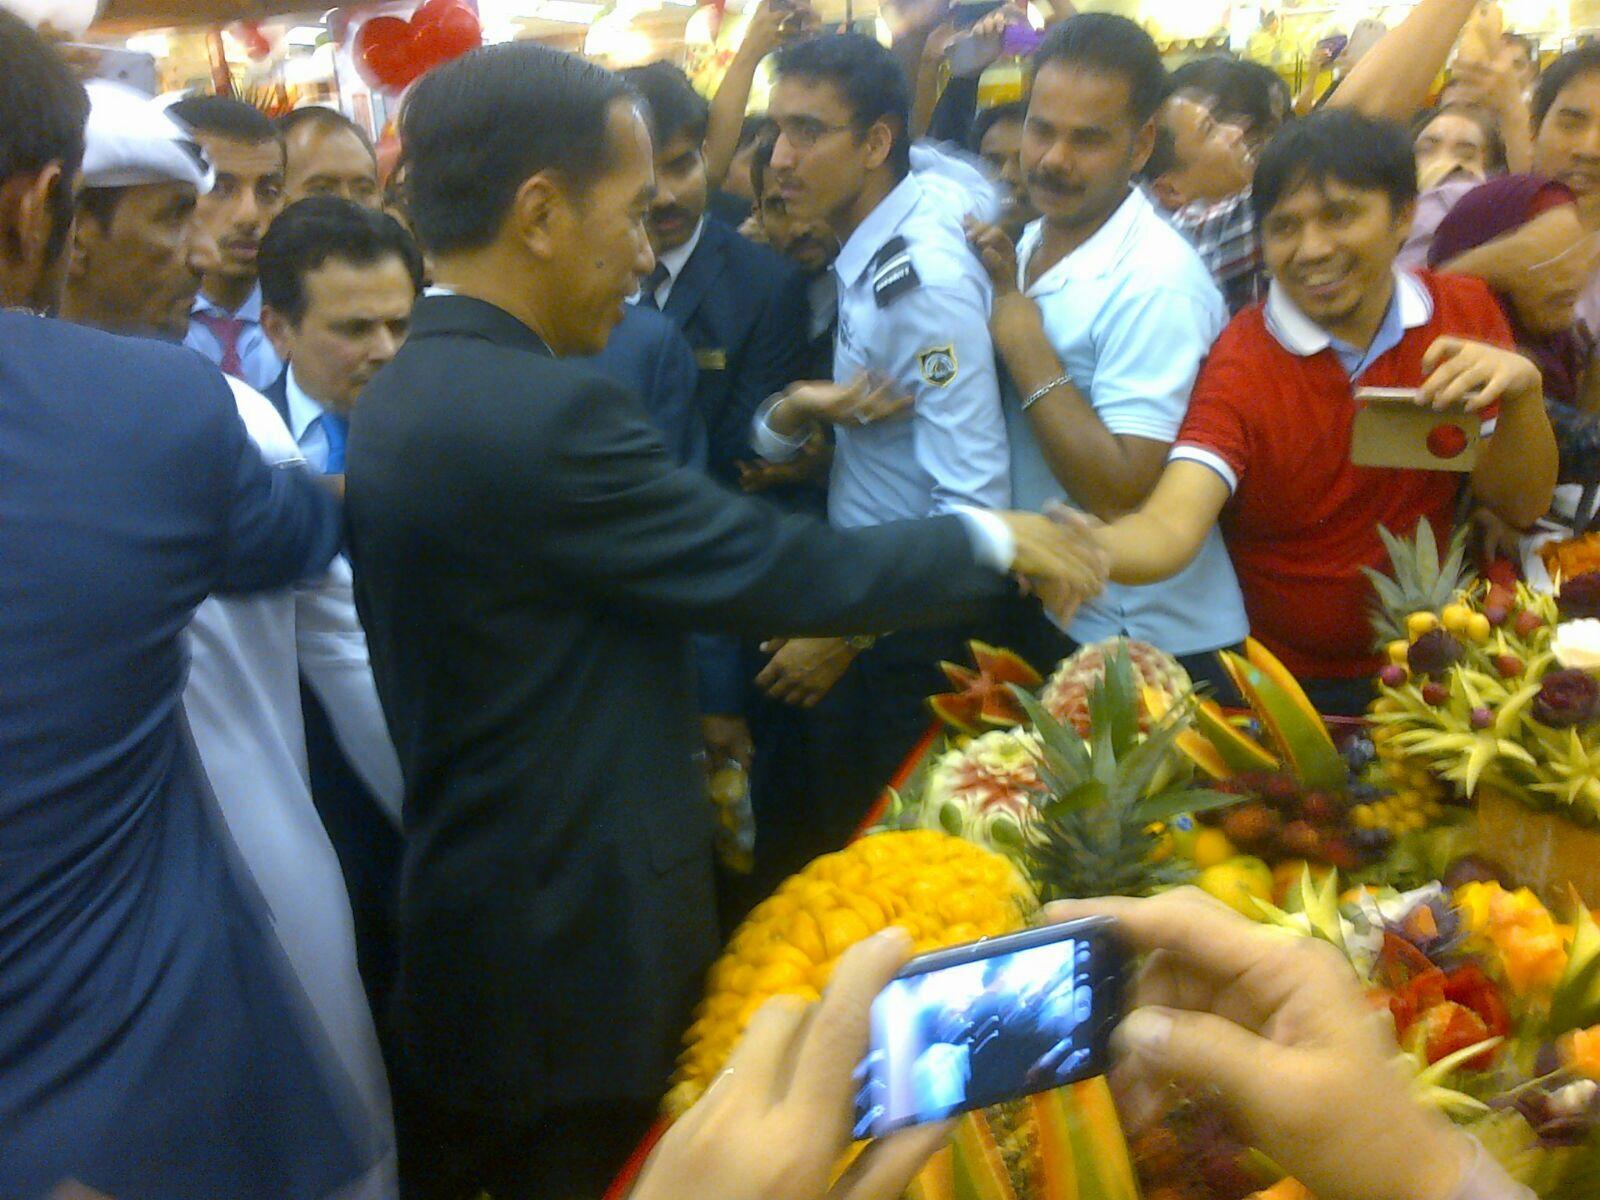 Presiden Jokowi disambut antusias WNI saat berkunjung ke Lulu Hypermart, Abu Dhabi, UEA, Minggu (13/9)